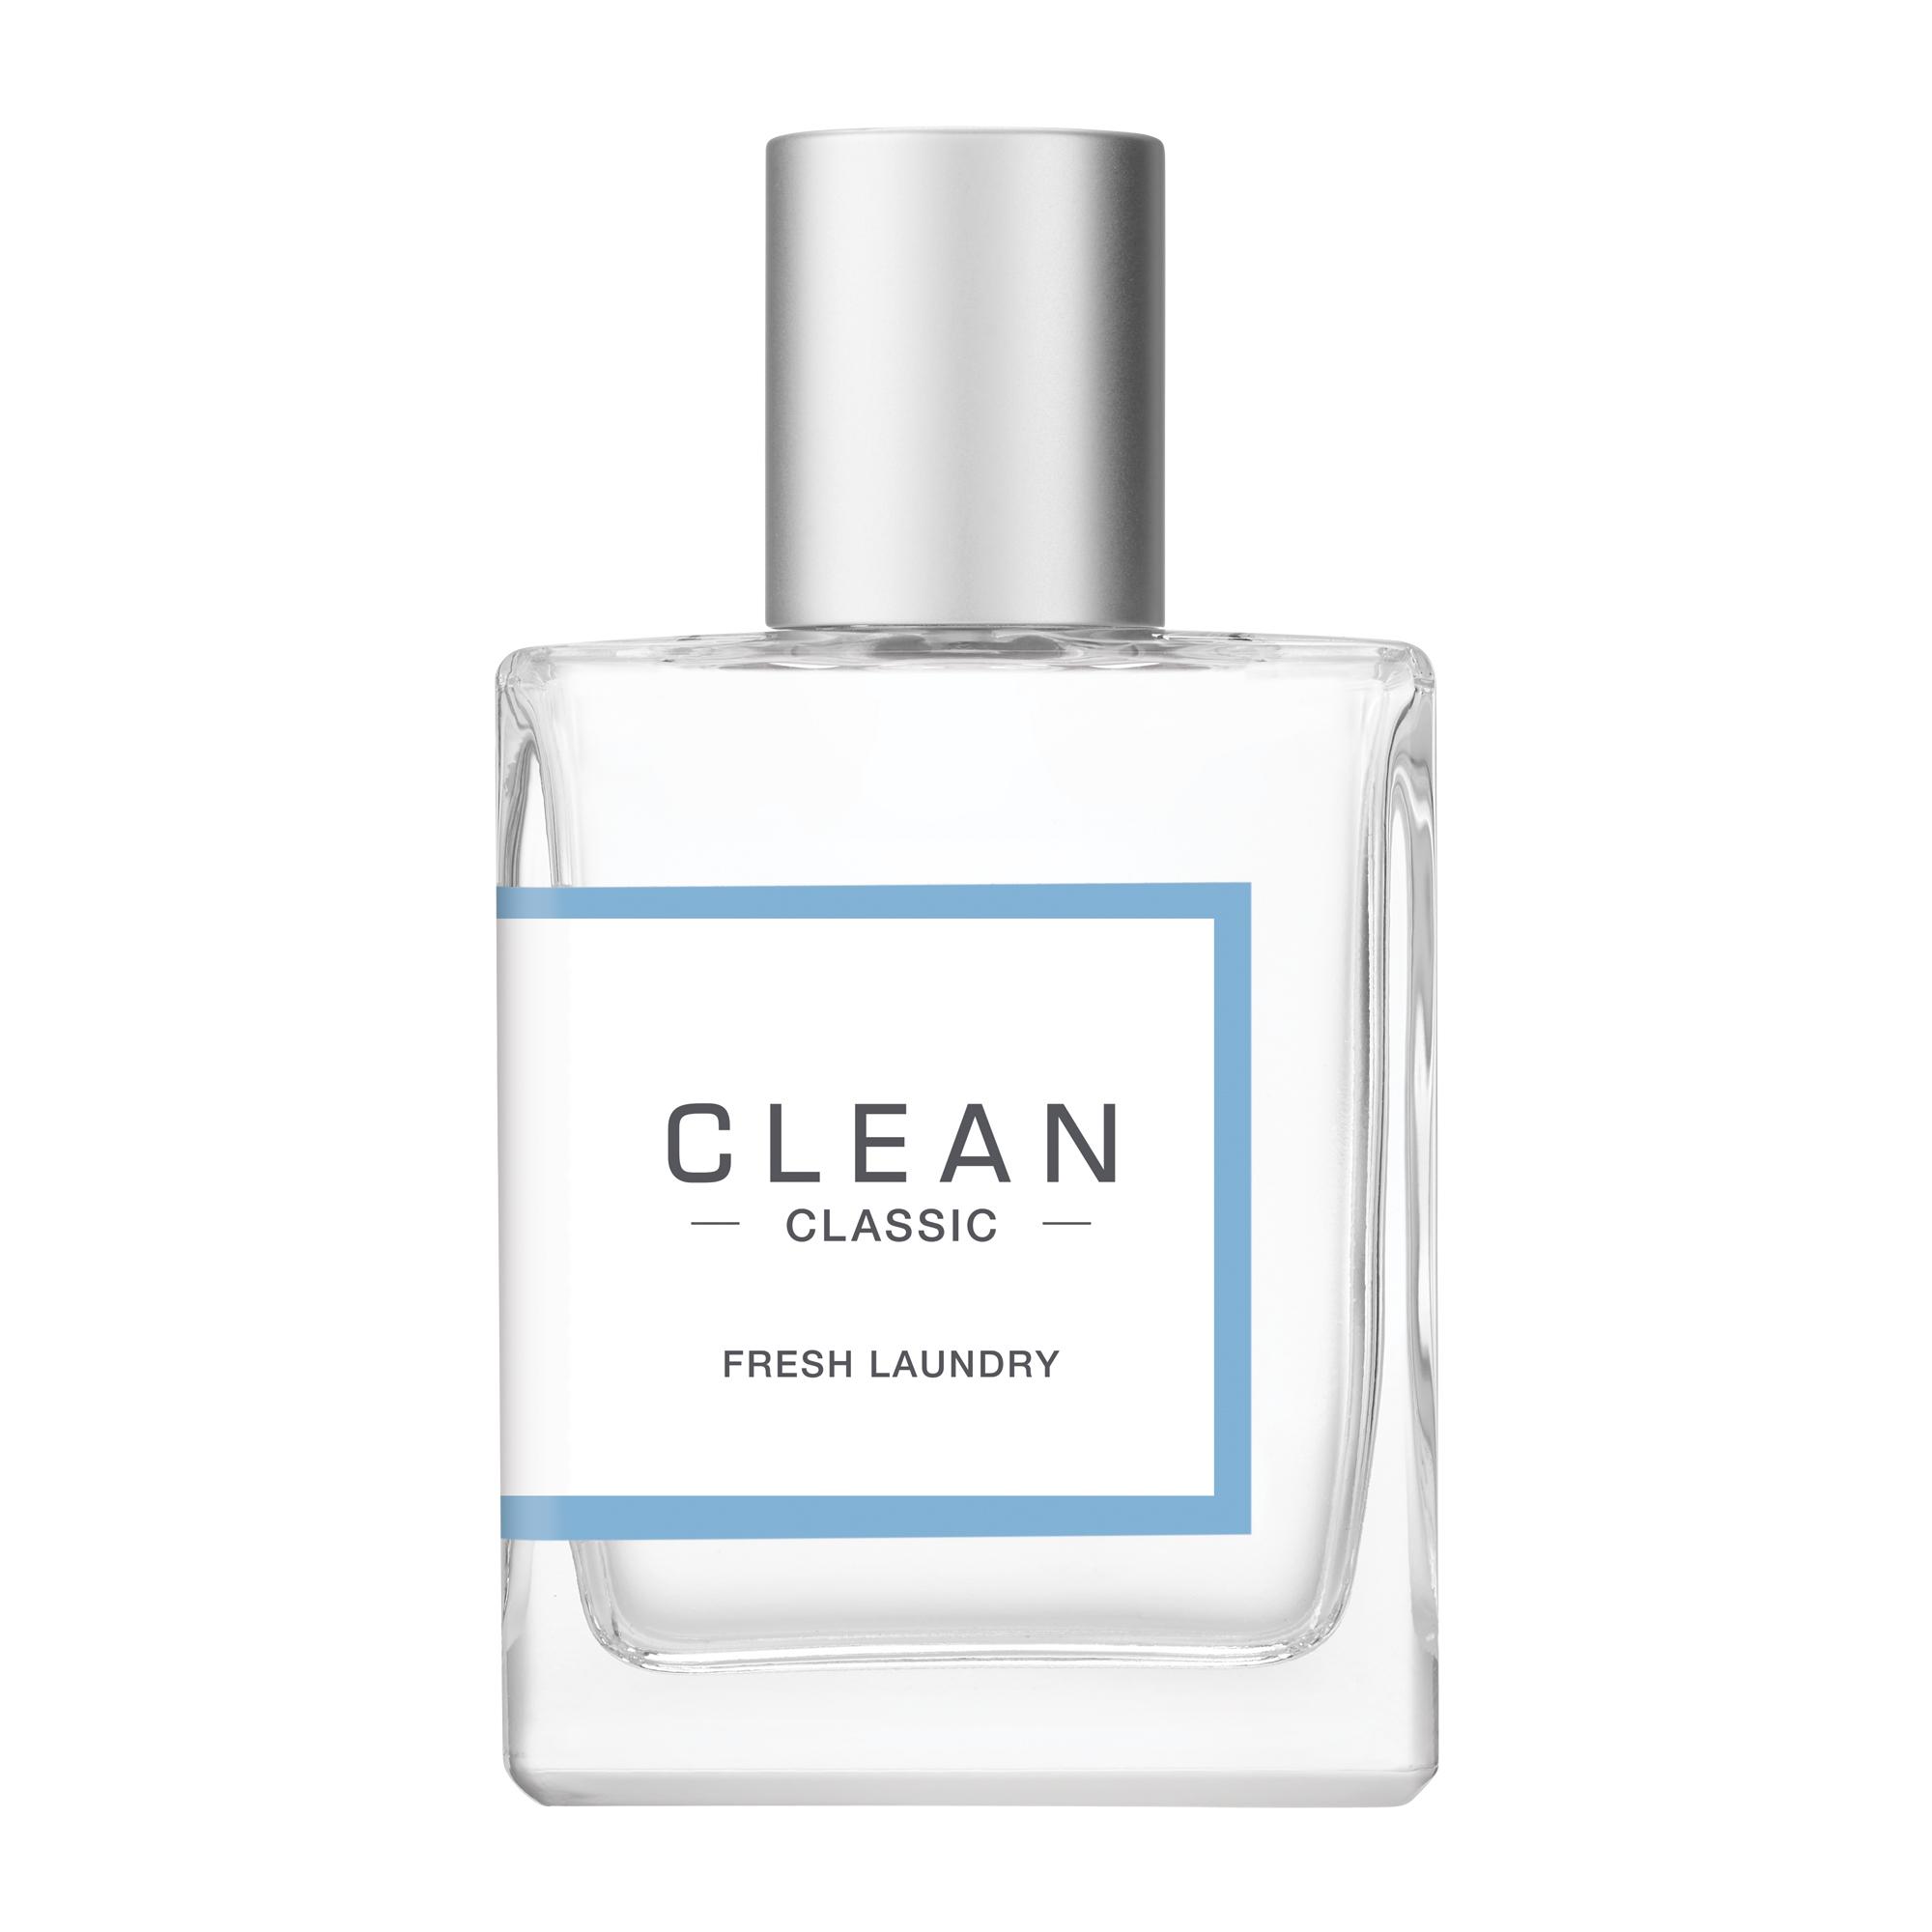 CLEAN Fresh Laundry EDP, 60 ml